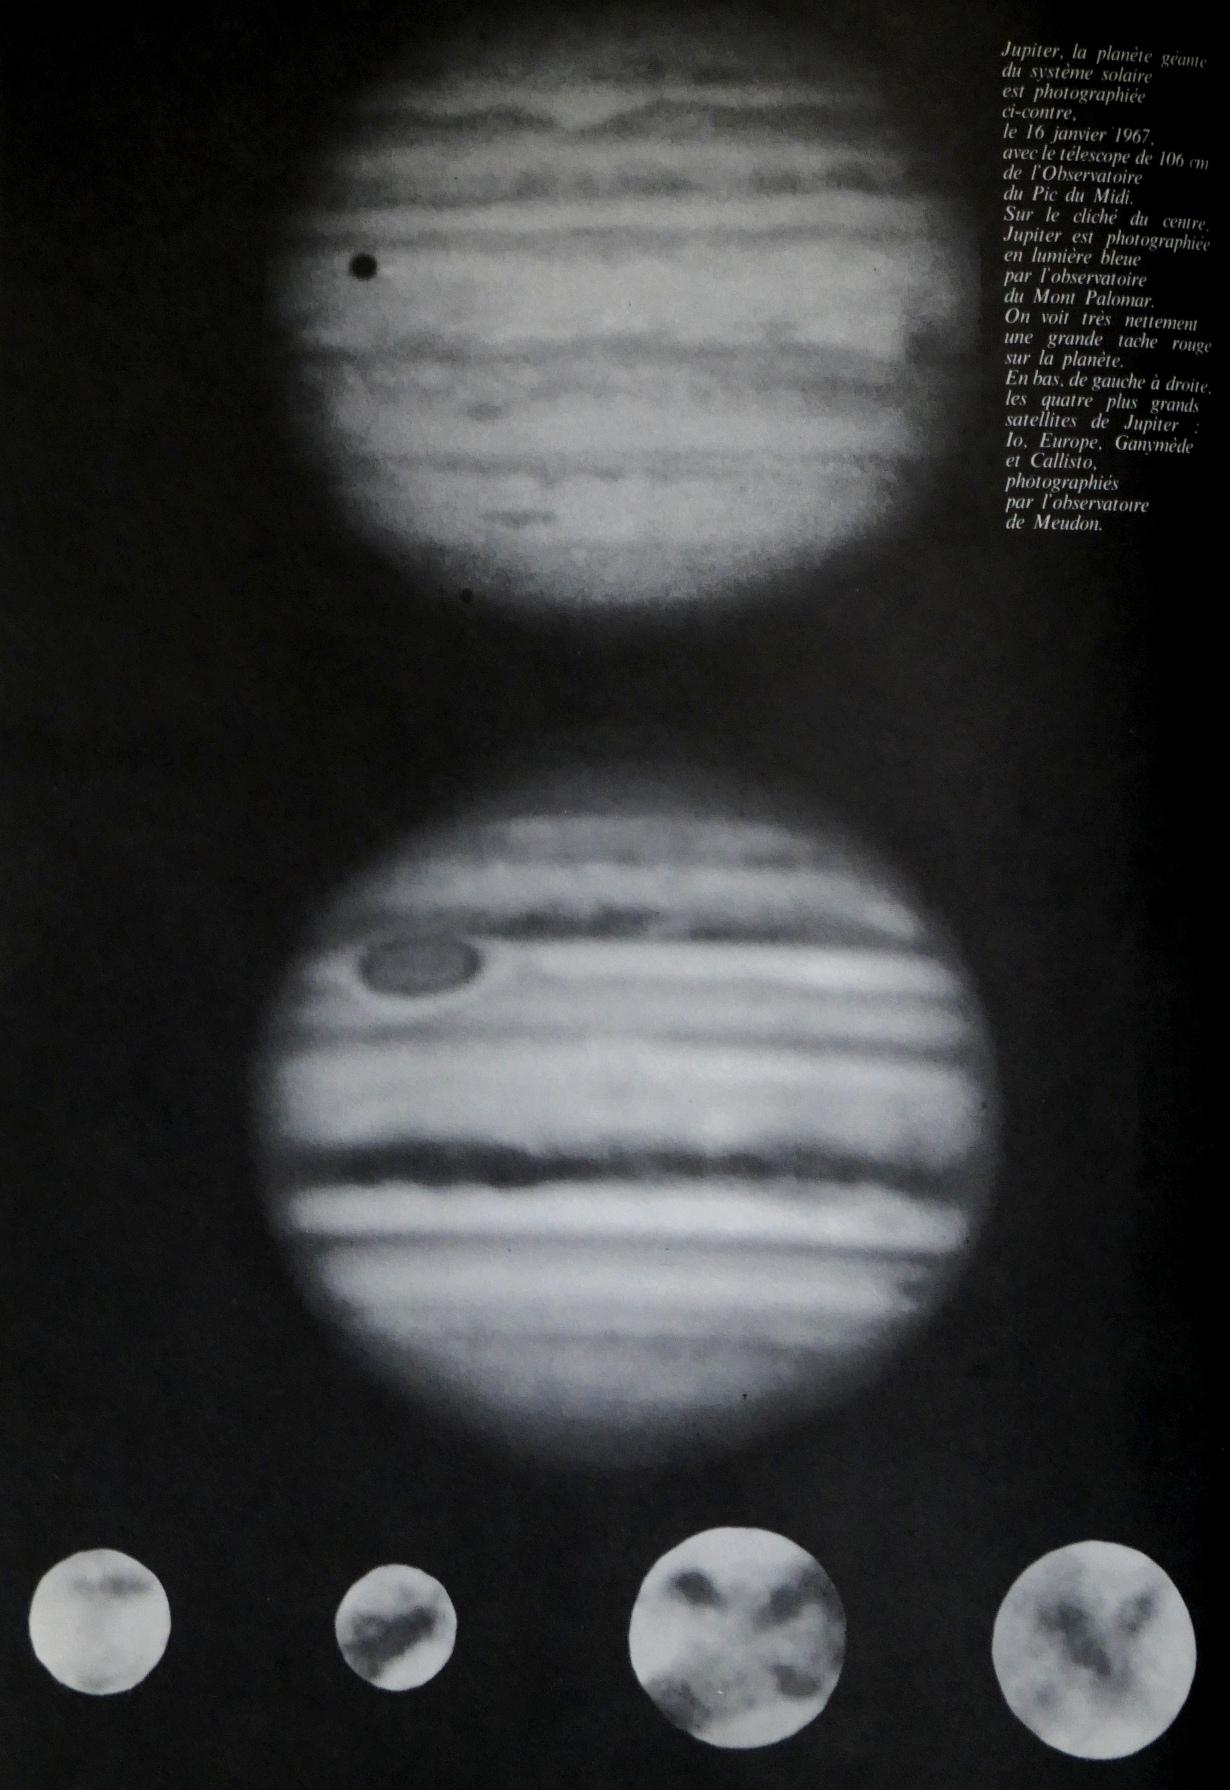 600f0352a917b_Notre-nouveau-monde-la-Lune_Science--Avenir_1969_Jupiter_ASF.JPG.238e63fe639e3e33e3d00a39a182cbe7.JPG